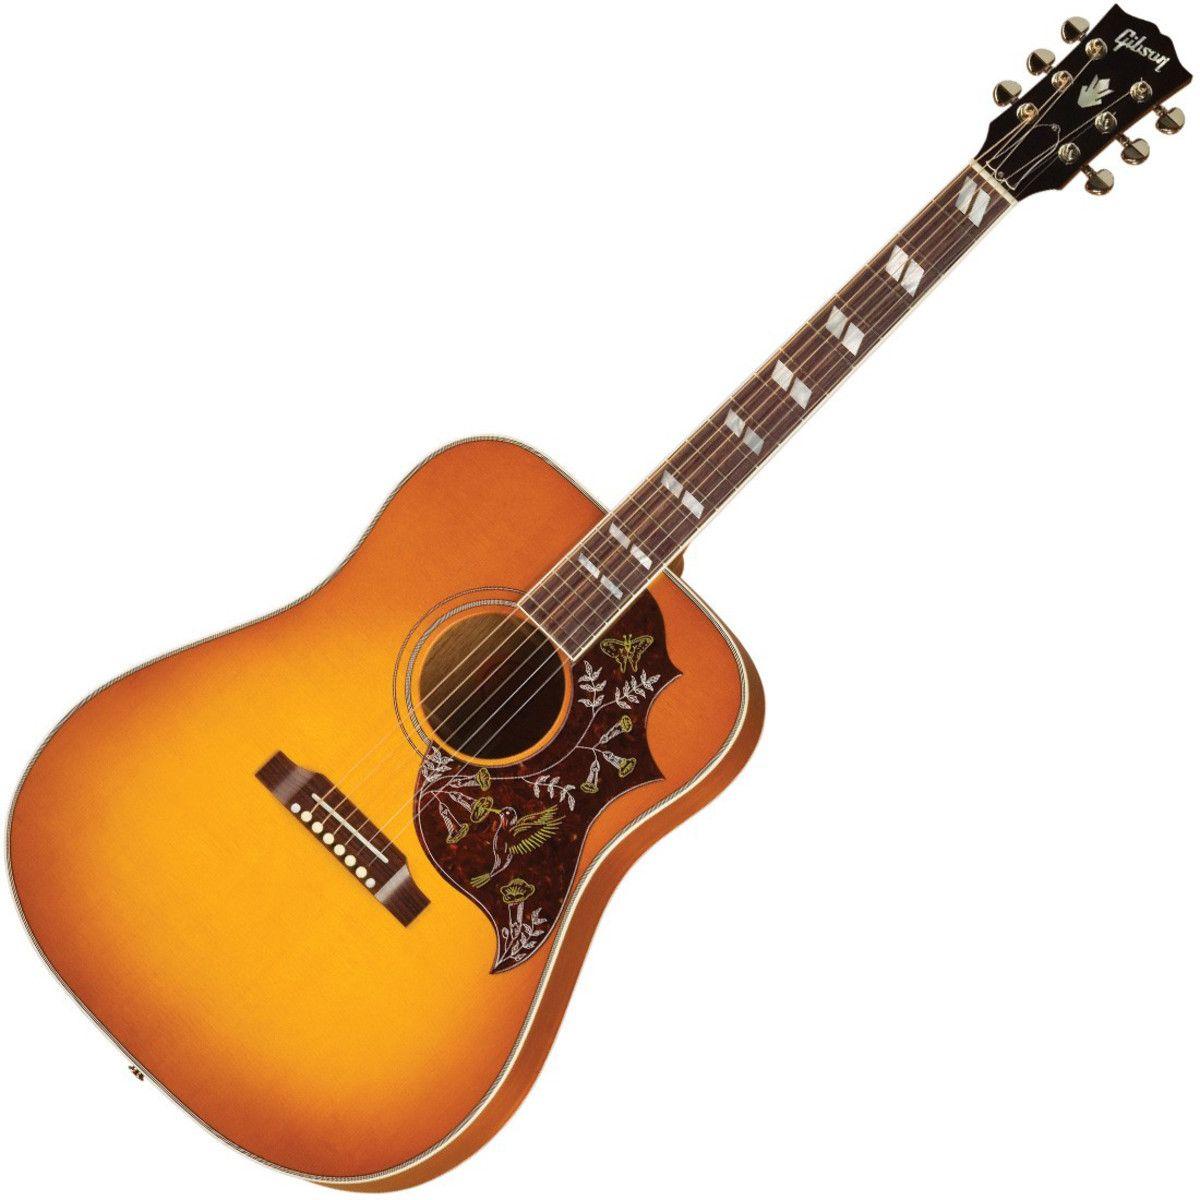 Gibson Hummingbird Electro Acoustic Guitar Heritage Cherry Sunburst At Gear4music Com Electro Acoustic Guitar Gibson Acoustic Guitar